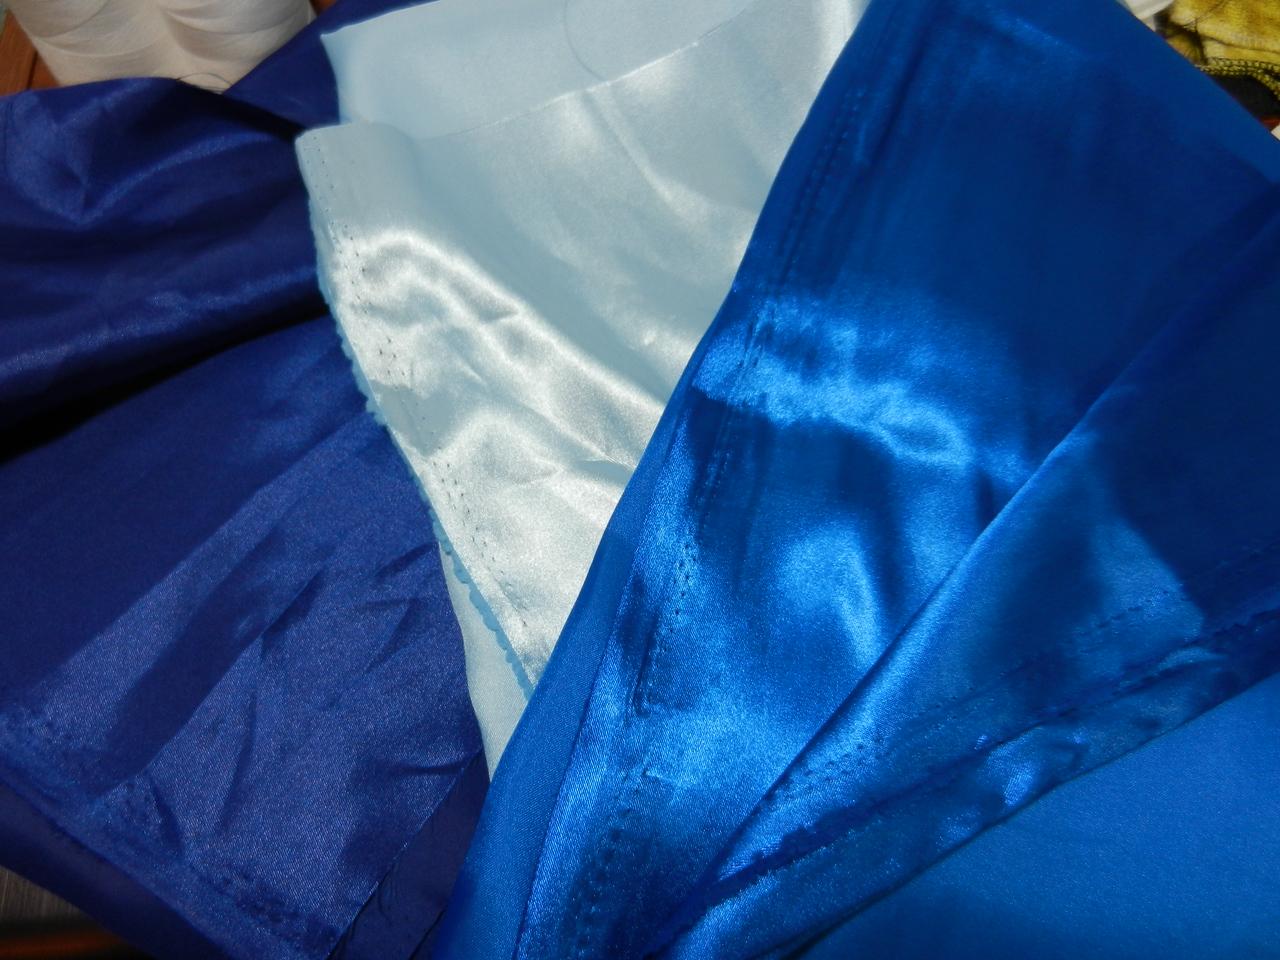 left - darker blue satin - not as shiny middle - light blue satin - shiny right - med blue satin - shiny